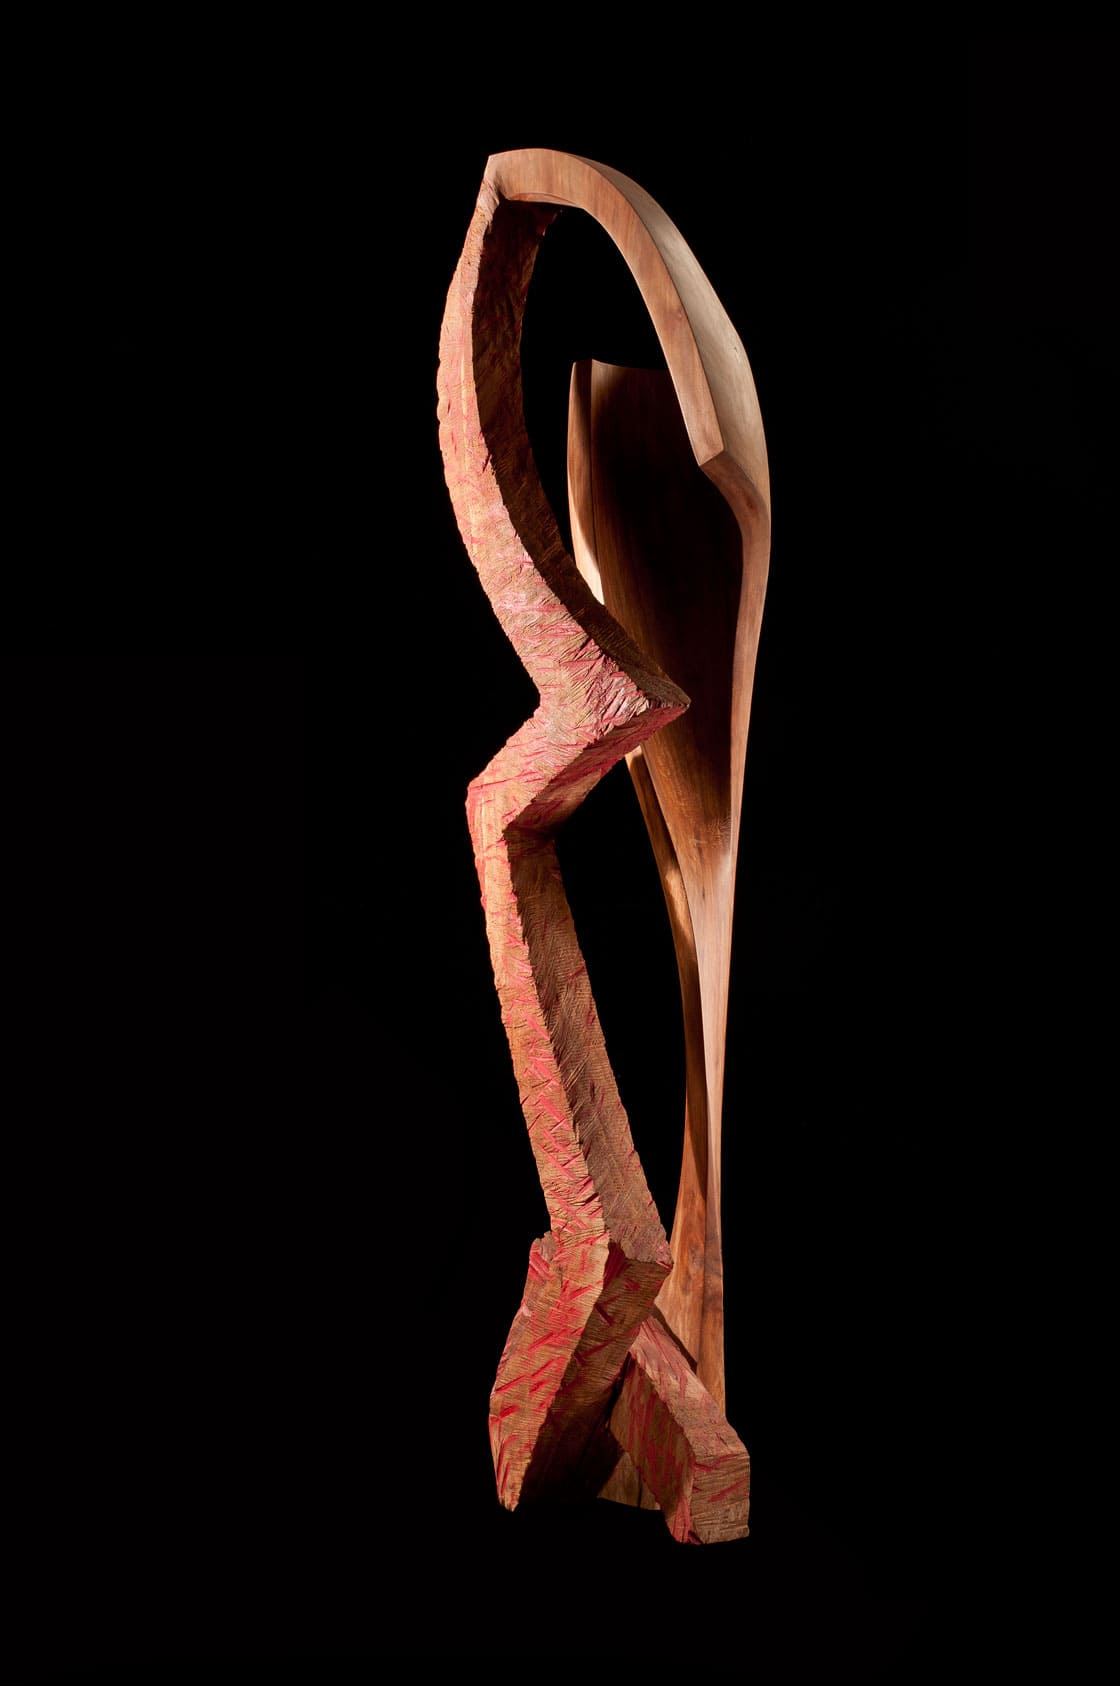 alireza-masoomi-artwork named figure